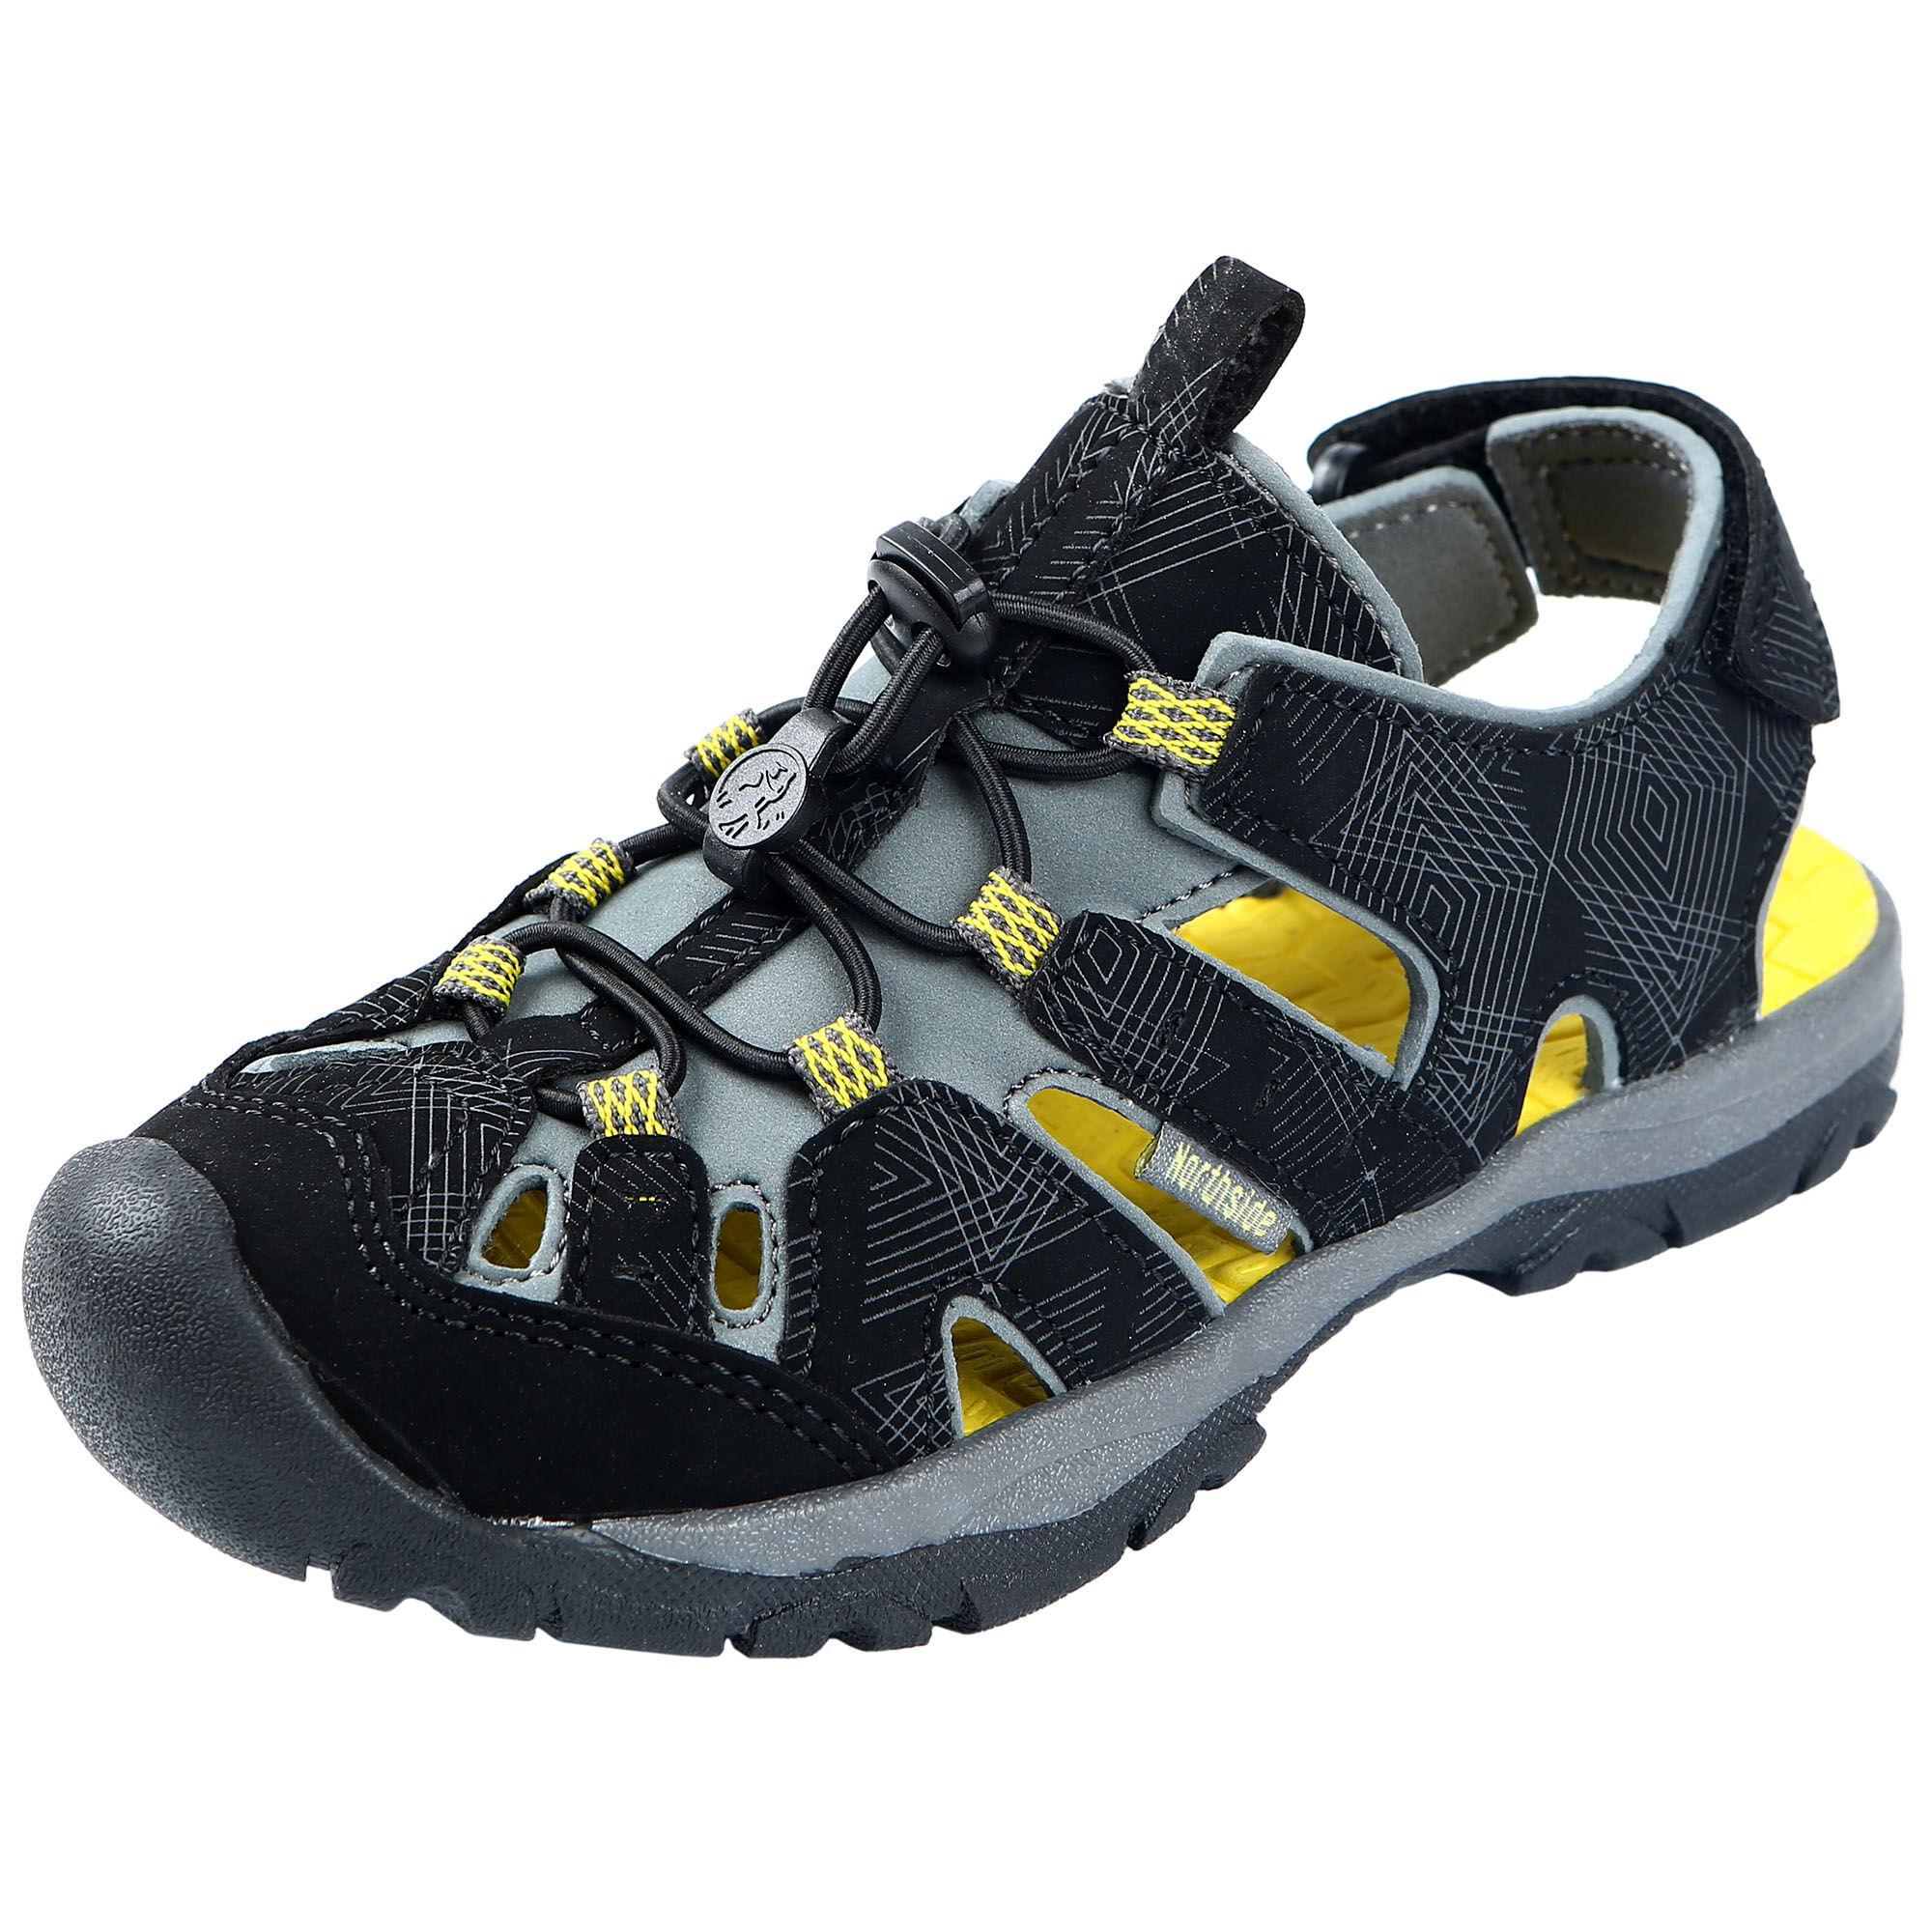 Northside Boy's Burke SE Sport Sandals  - Black/Yellow - Size: 6